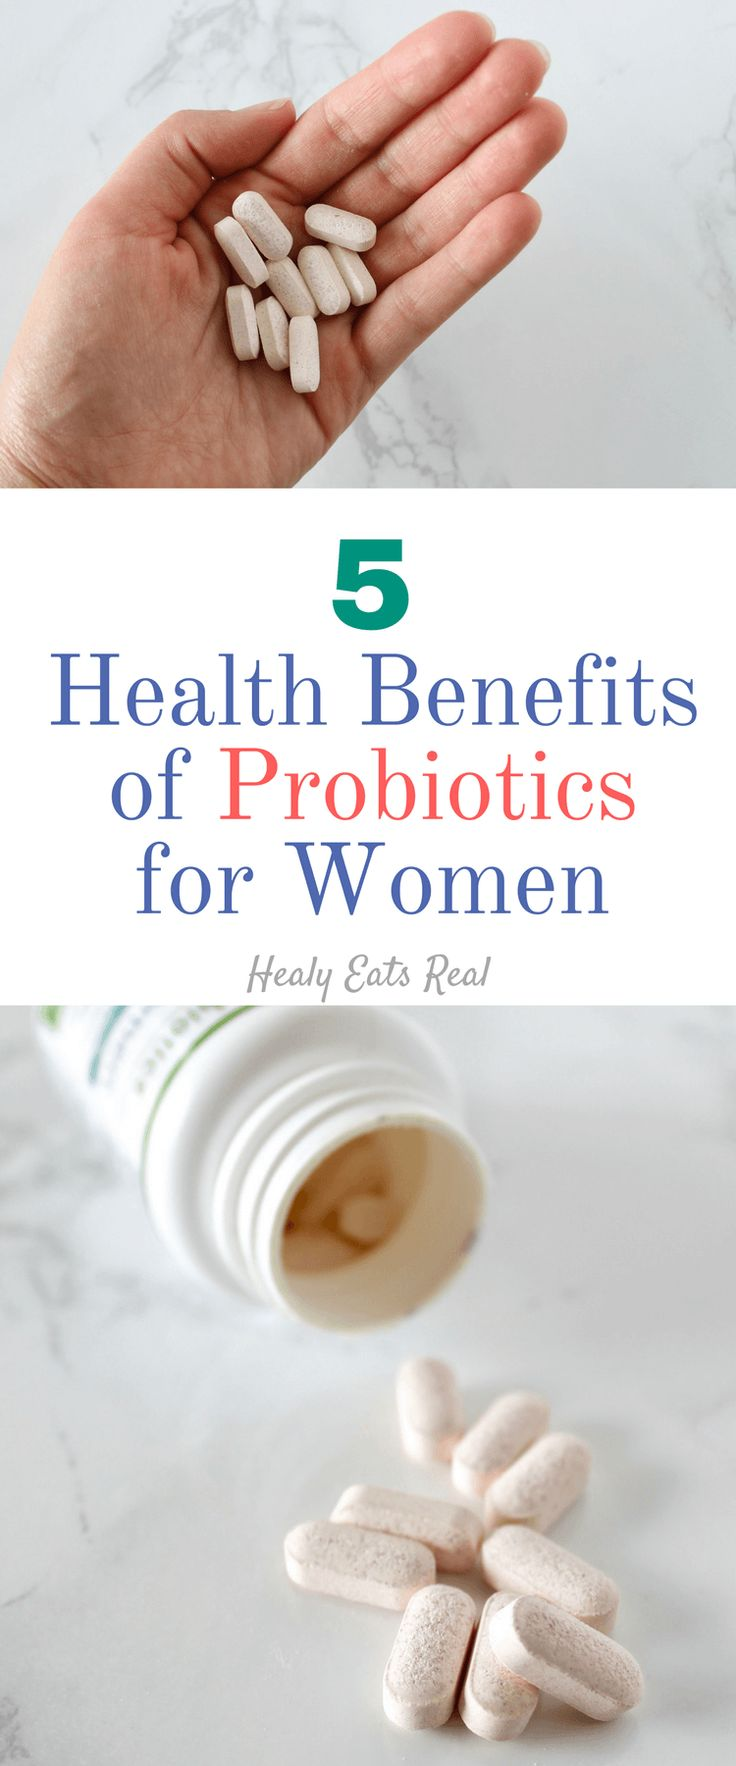 5 Health Benefits of Probiotics for Women- #followyourgut #HealthiestDaysAhead #Pmedia #ad @target @hyperbiotics